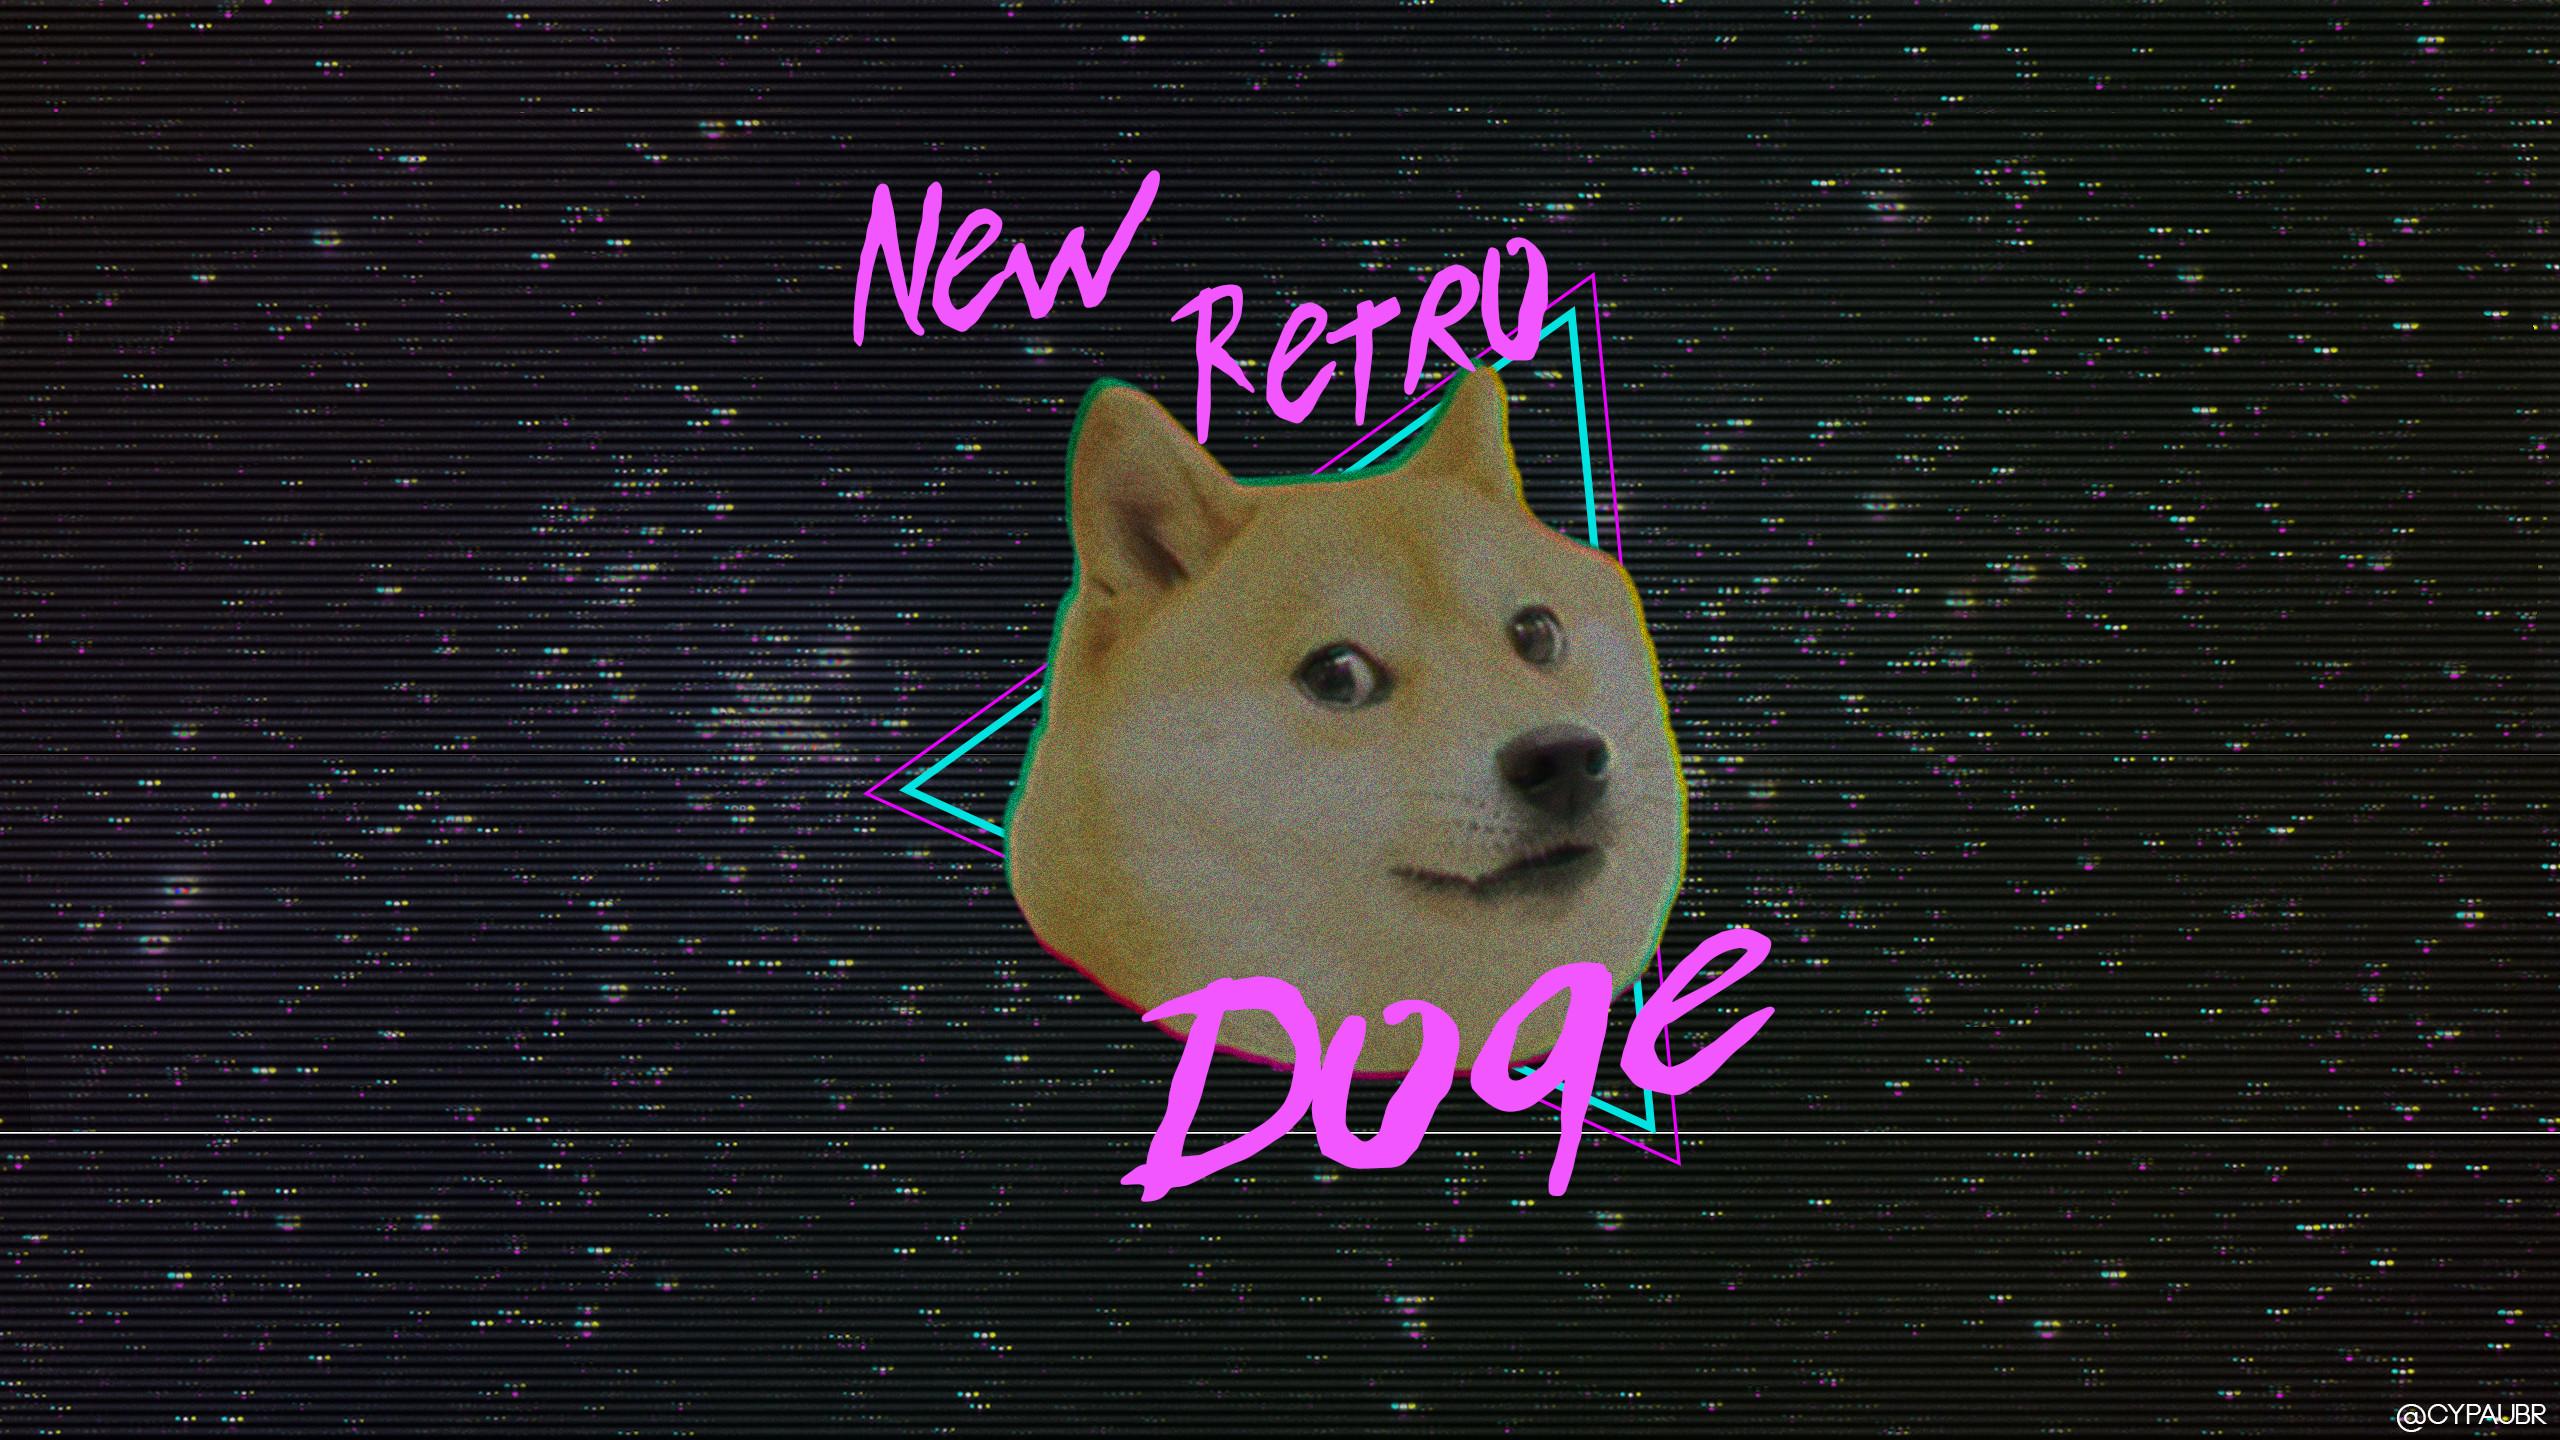 doge, Retro style, New Retro Wave, Animals, Dog, Shiba Inu,